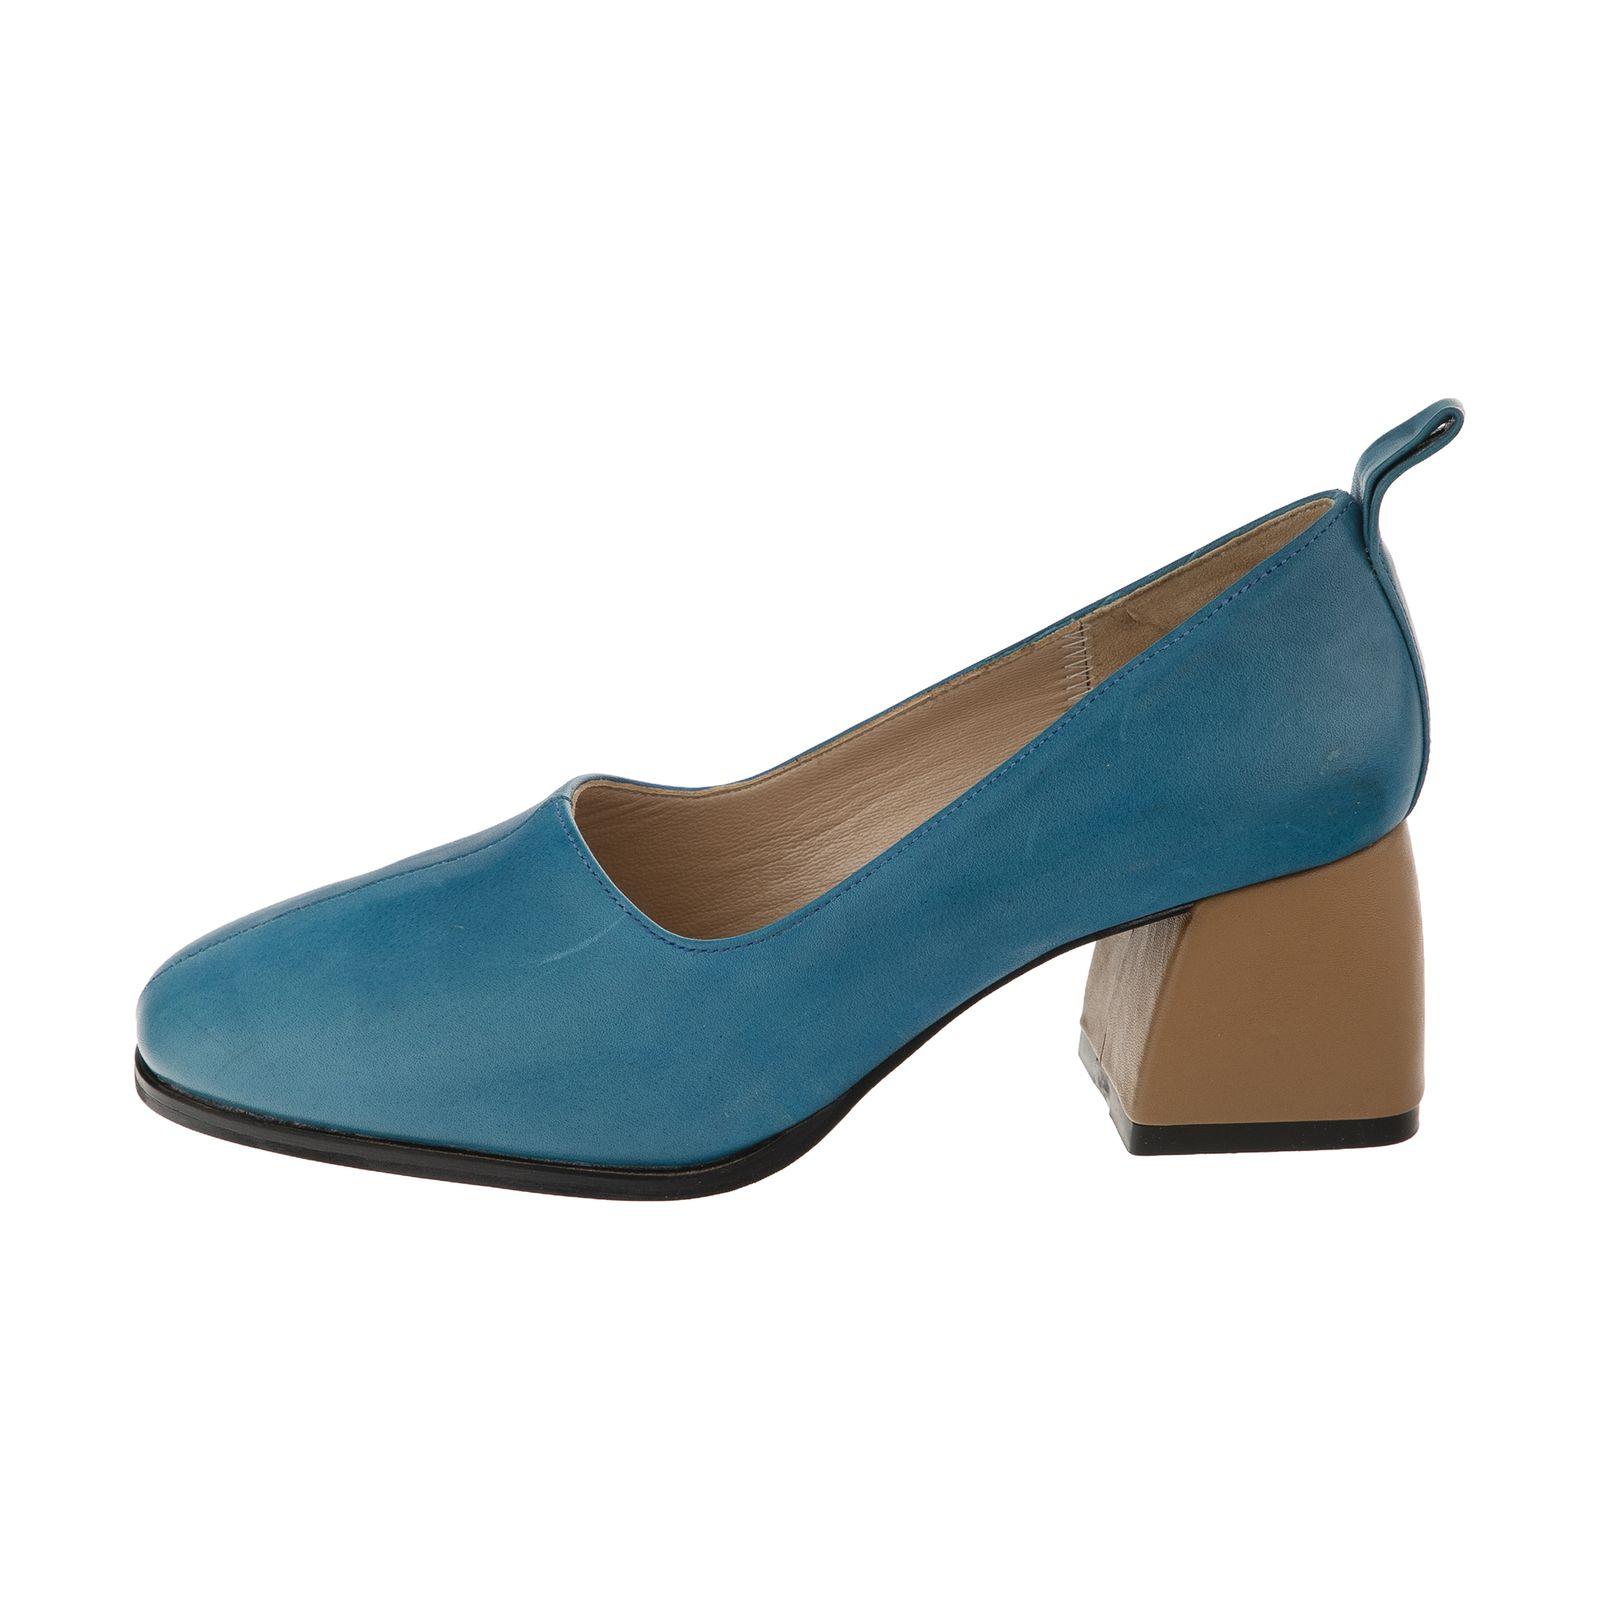 کفش زنانه آرتمن مدل leroy-42694-158 -  - 2